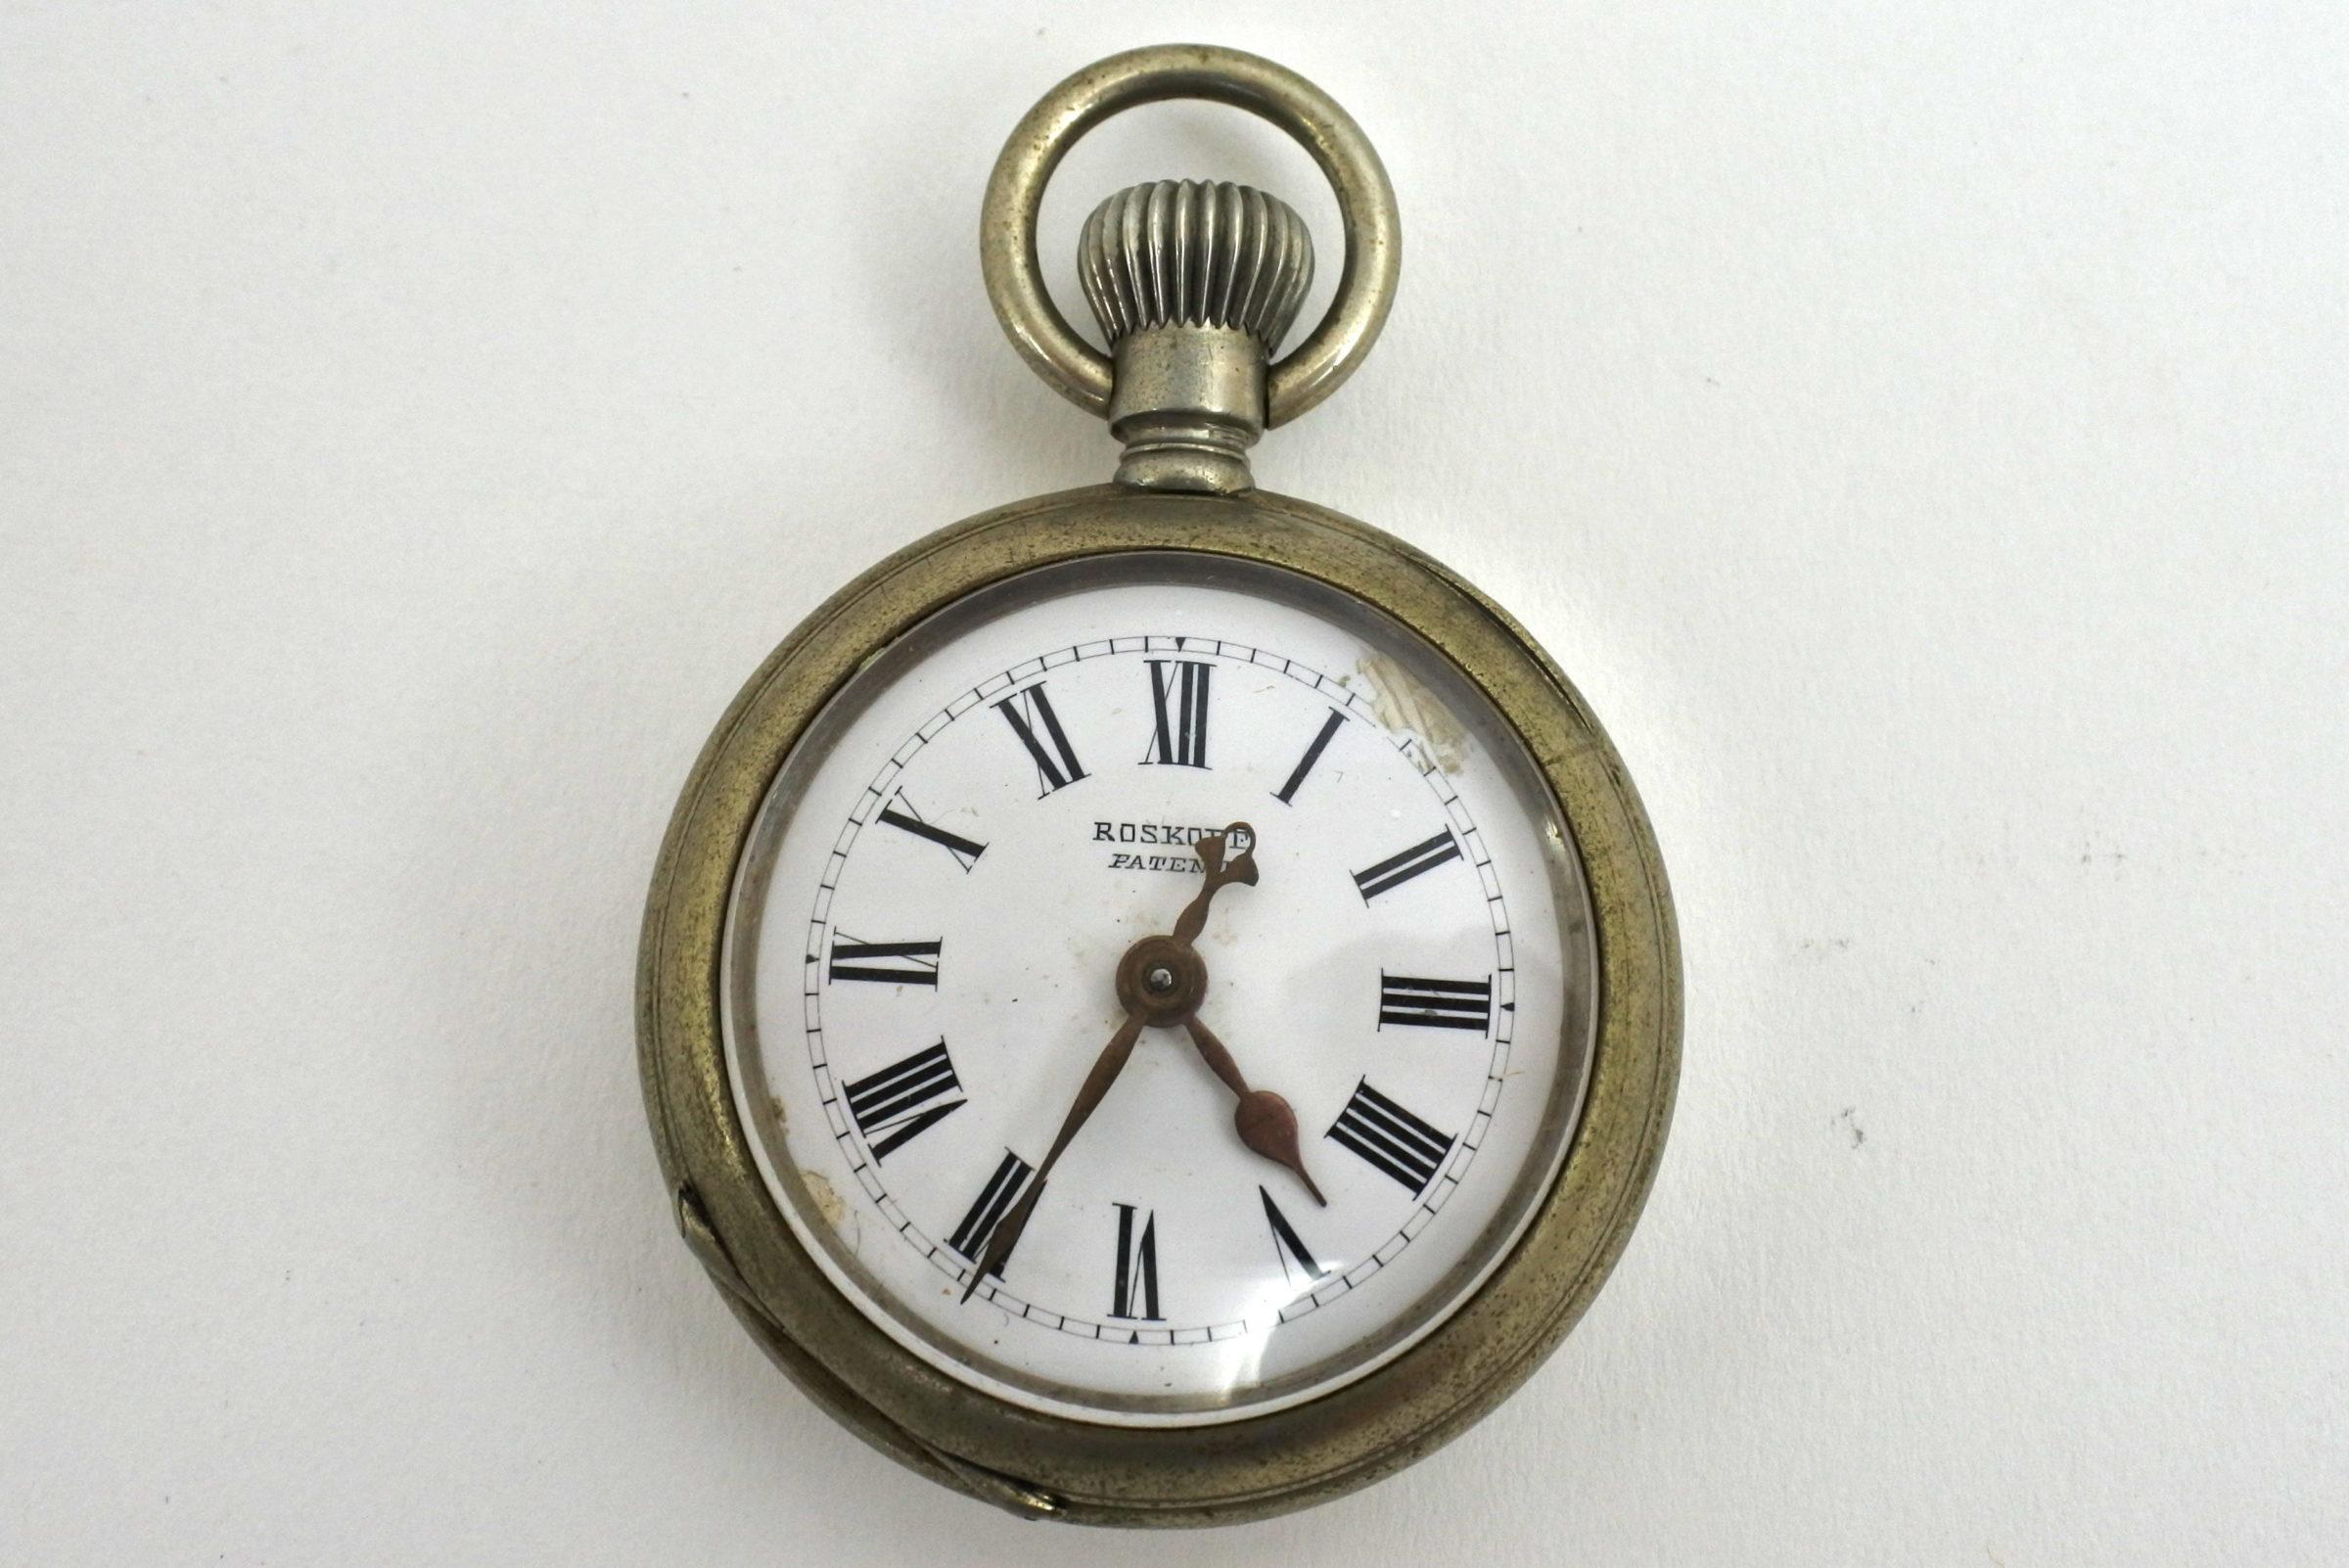 Orologio da tasca Roskopf patent